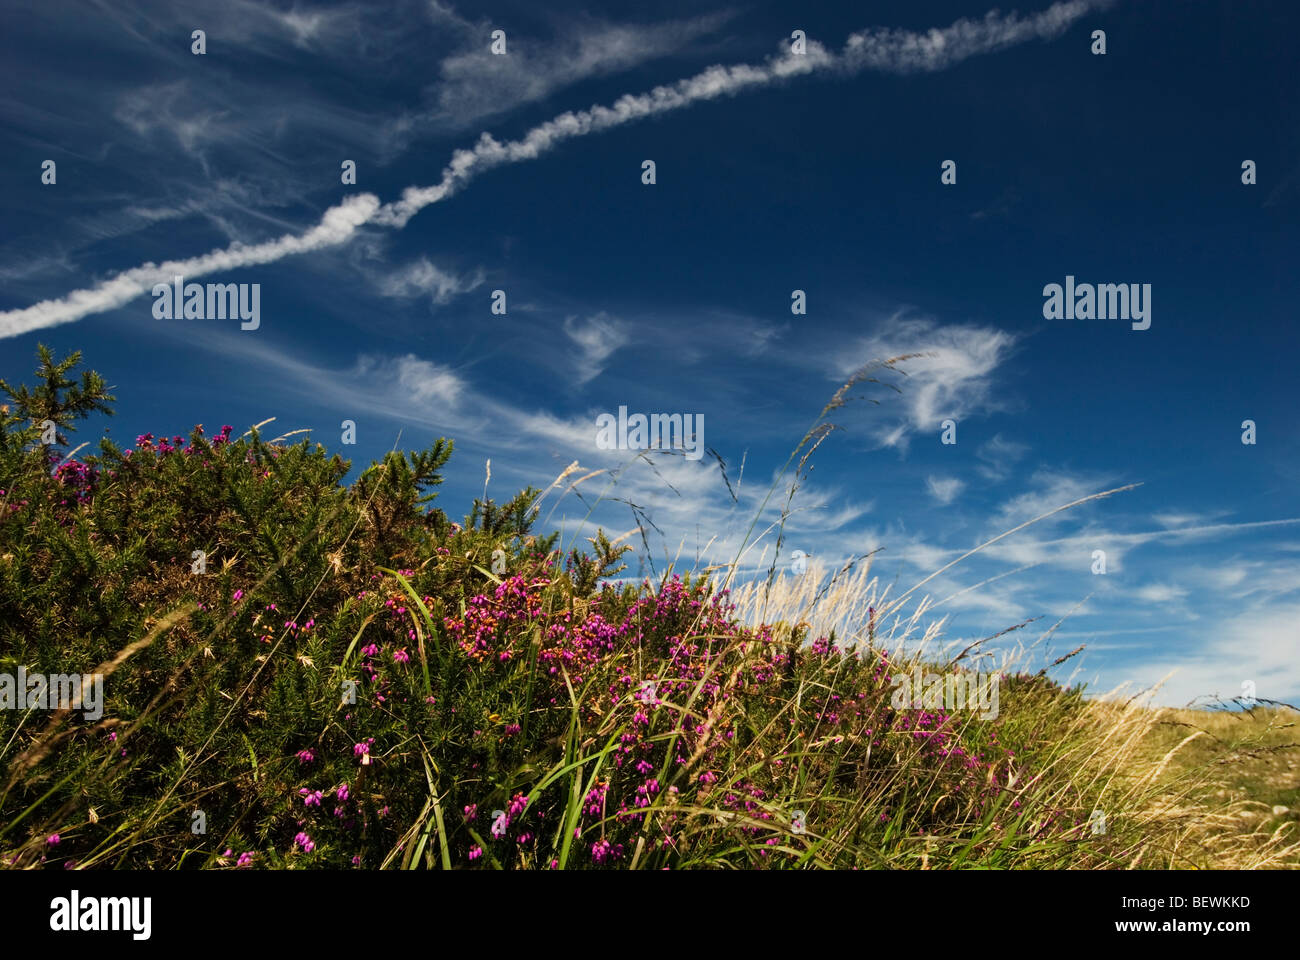 Flowering heather against a vivid blue sky and wispy clouds, Dartmoor, Devon UK - Stock Image